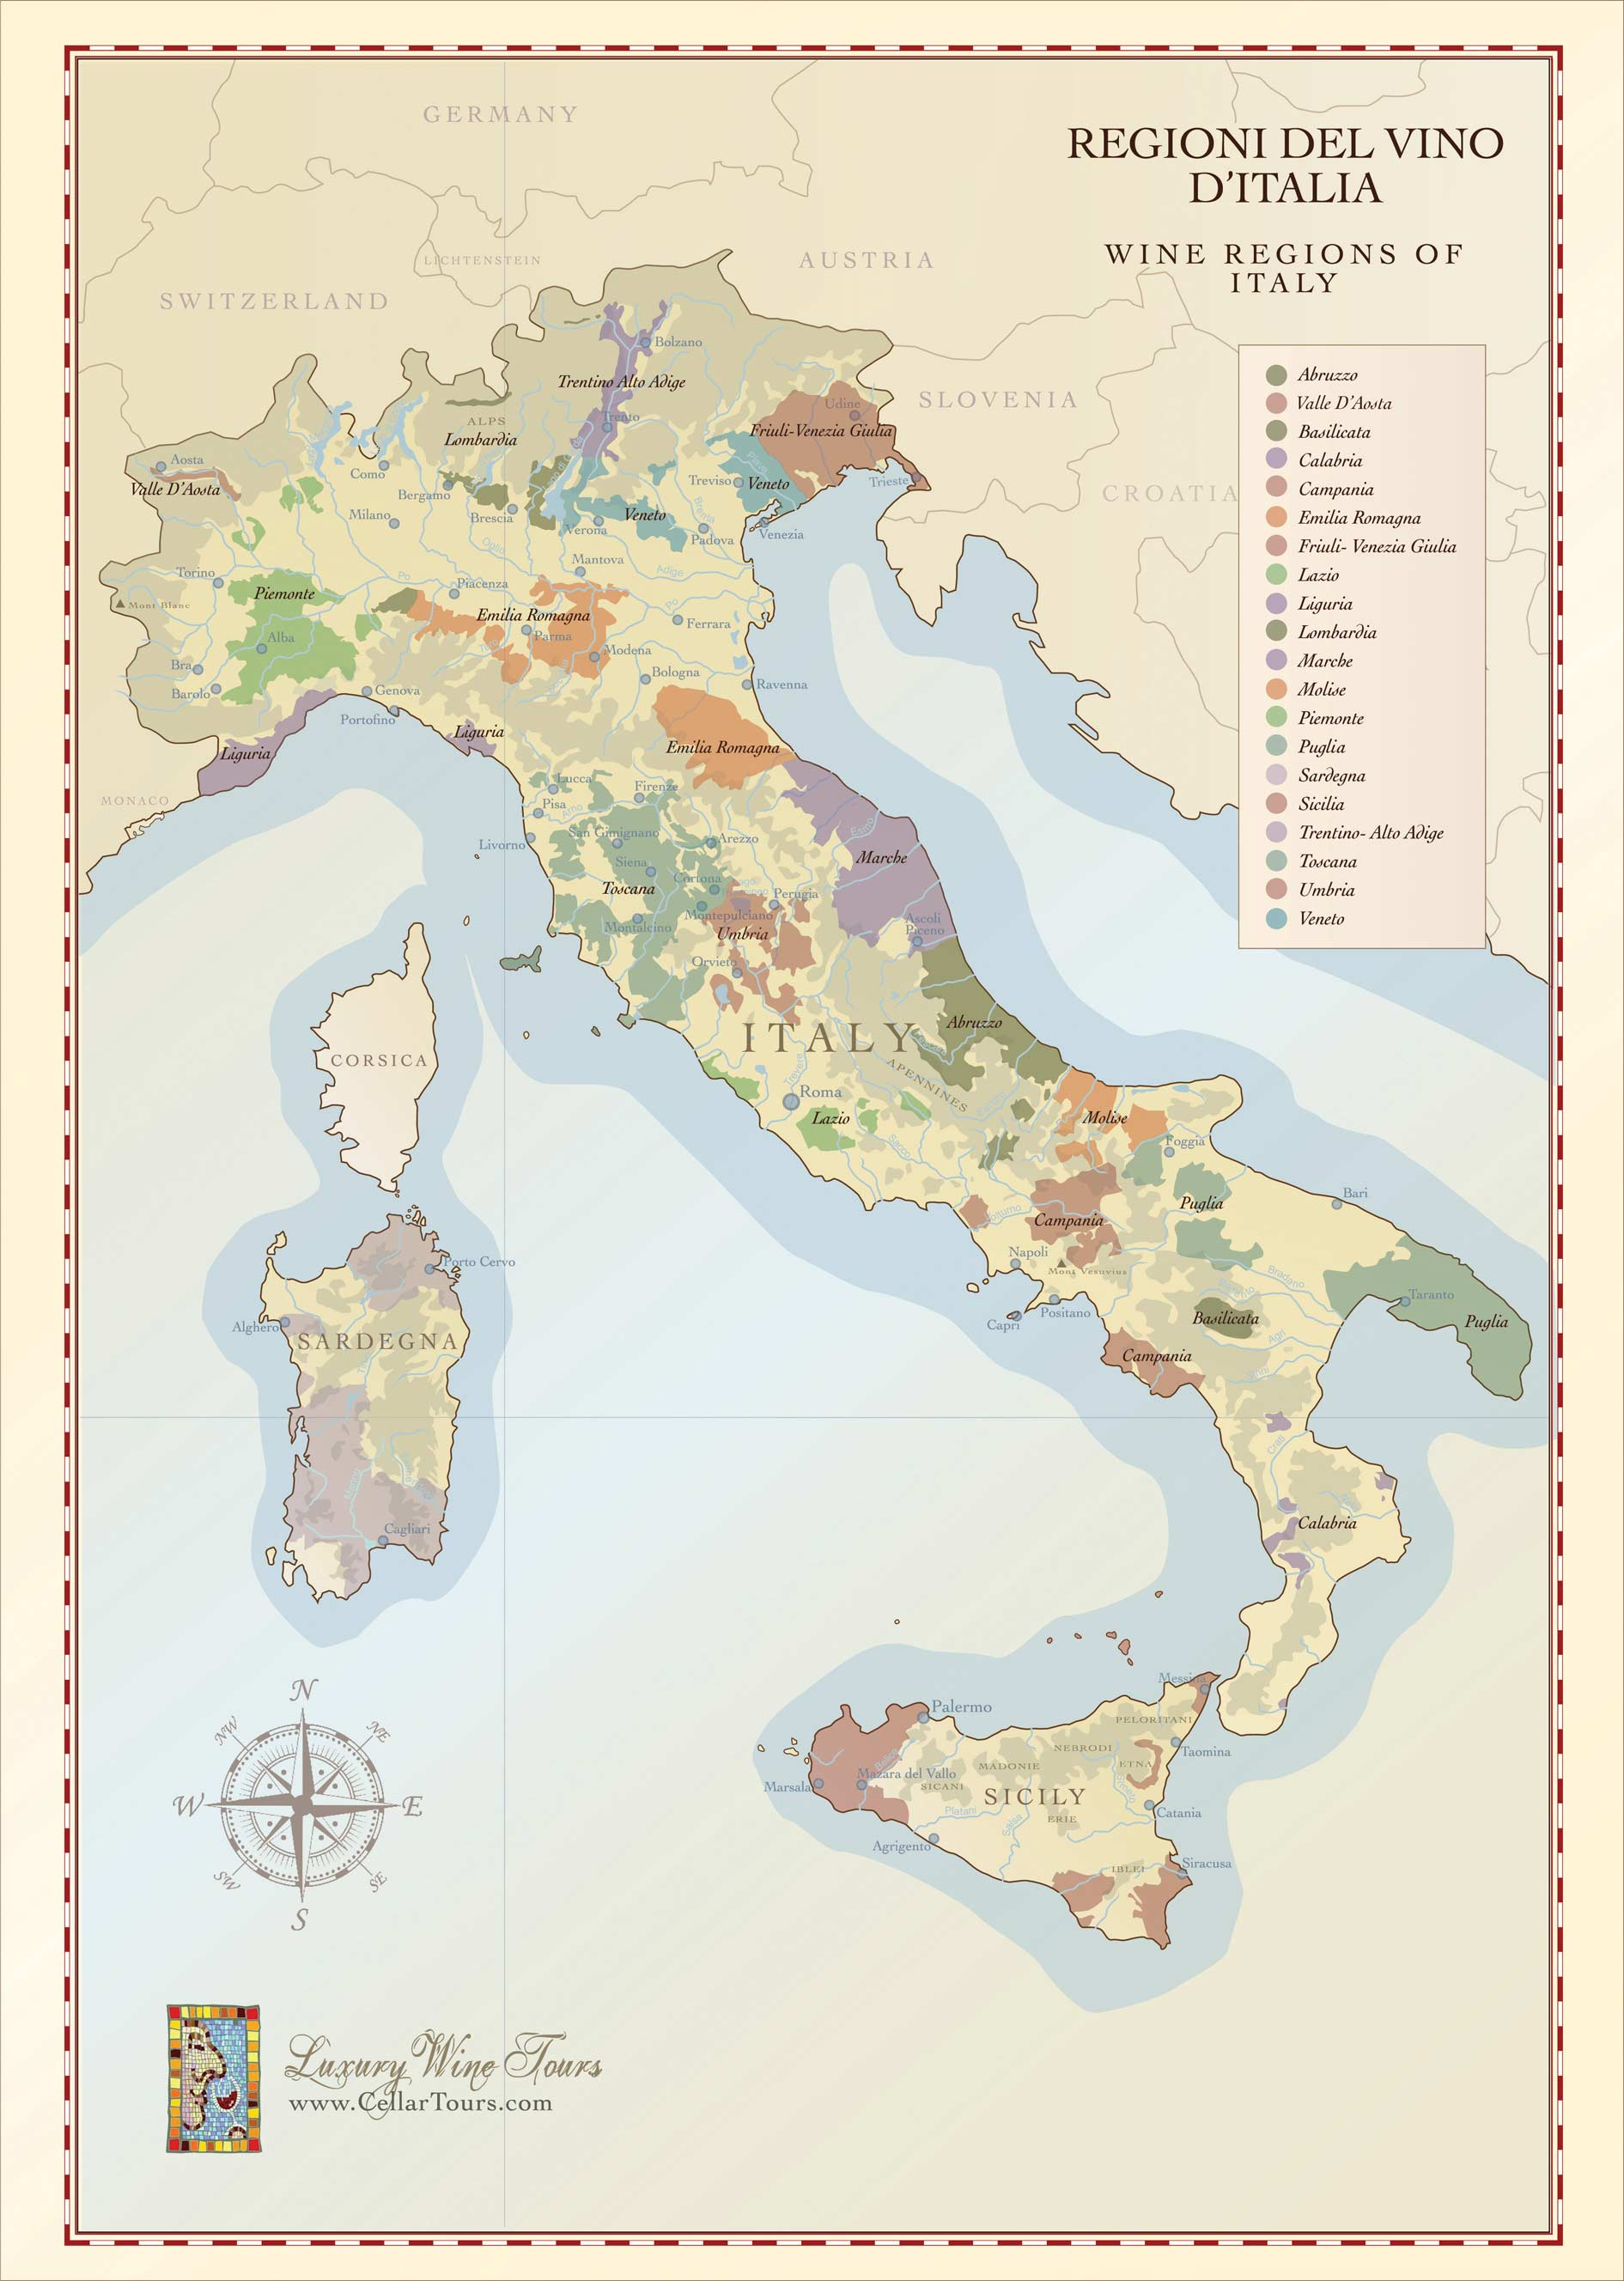 Italian Wine Regions Map  Handcrafted Illustration  Cellar Tours